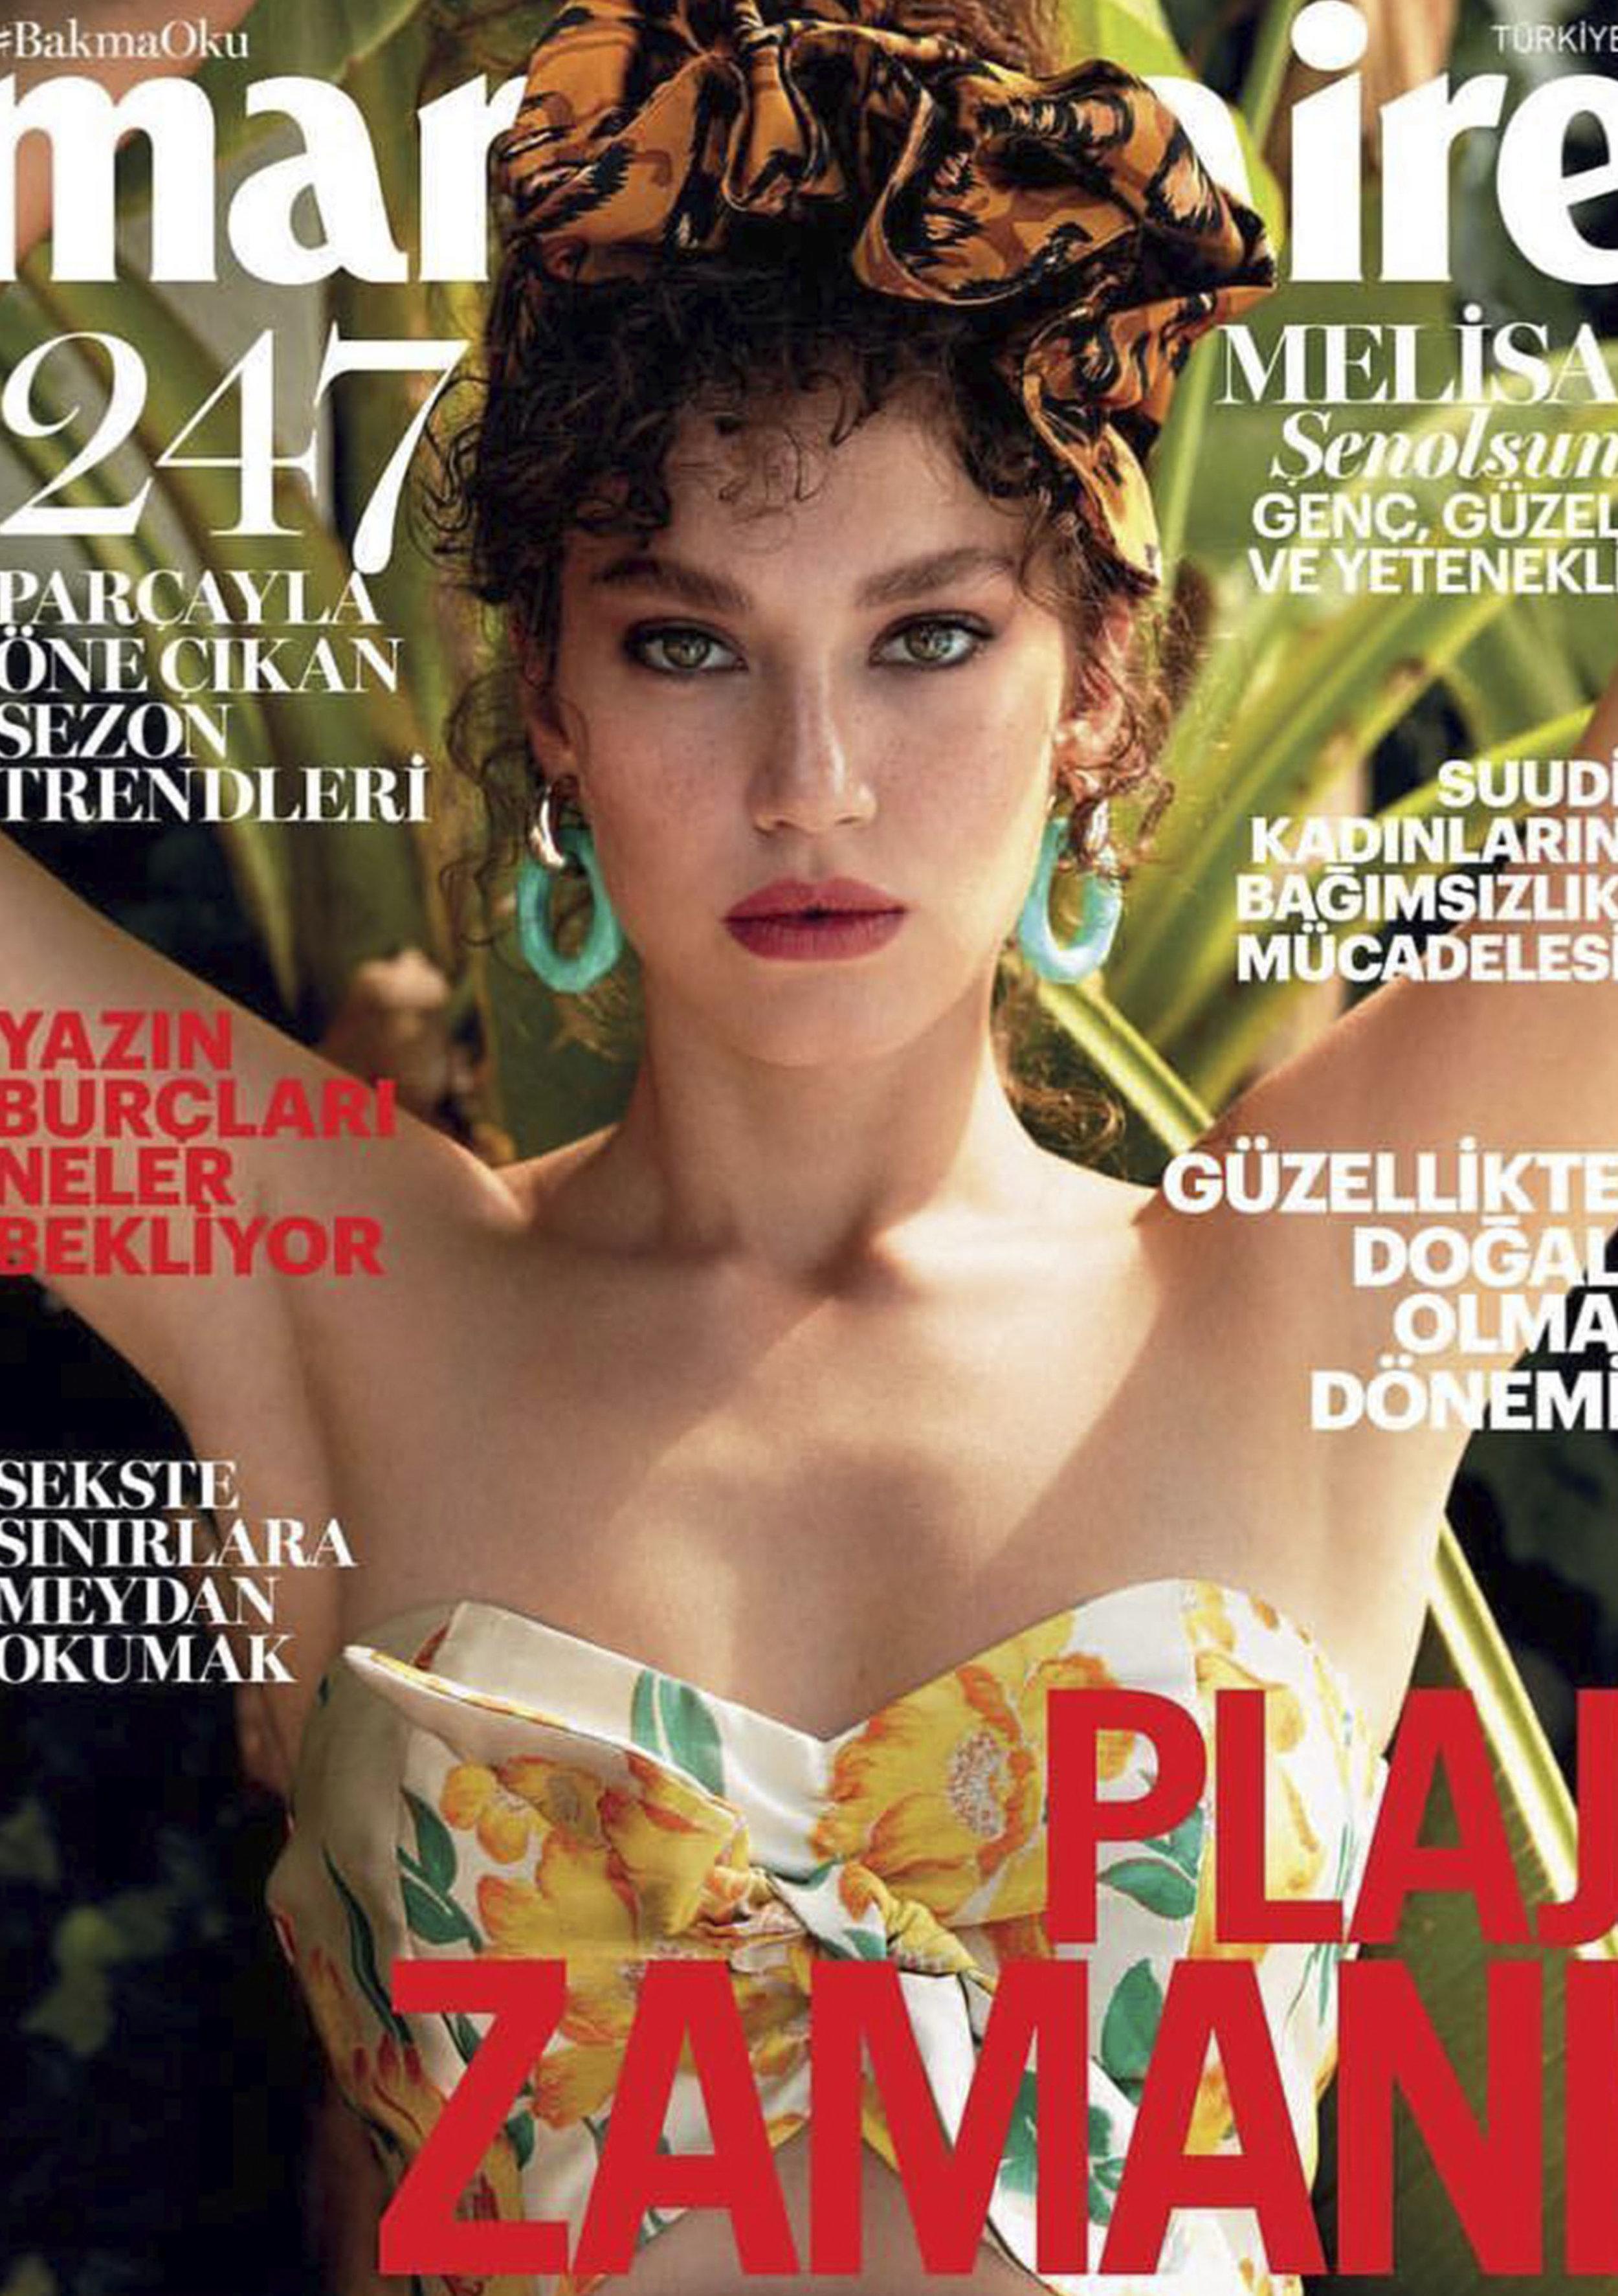 Marie ClaireTurkey - Melisa Senolsun 2018, August Issue Cover Story